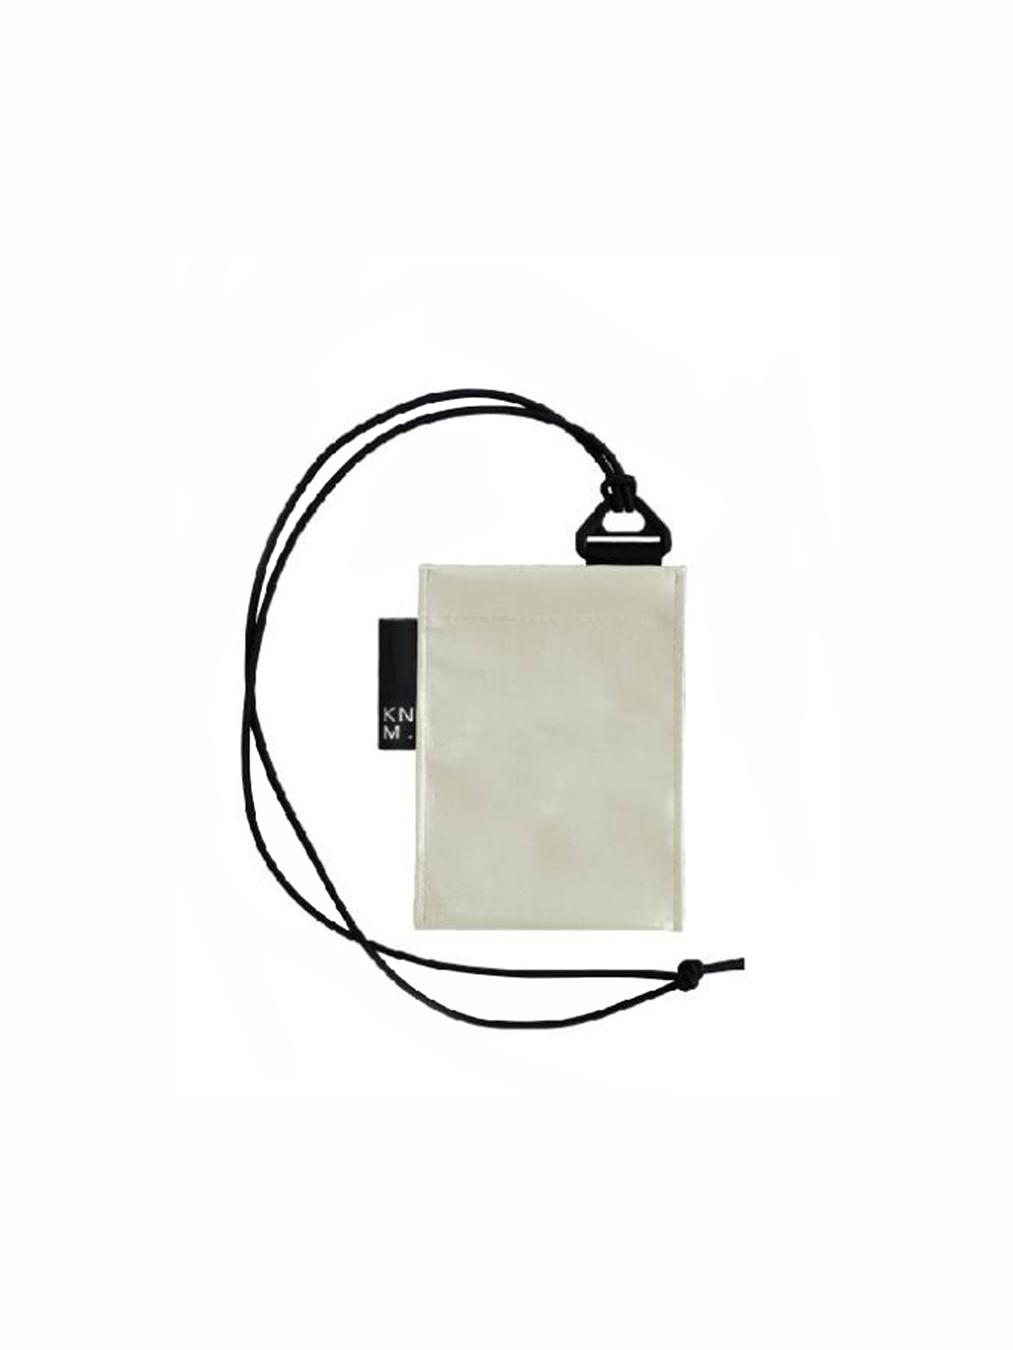 Pass Card Holder Strap (White)